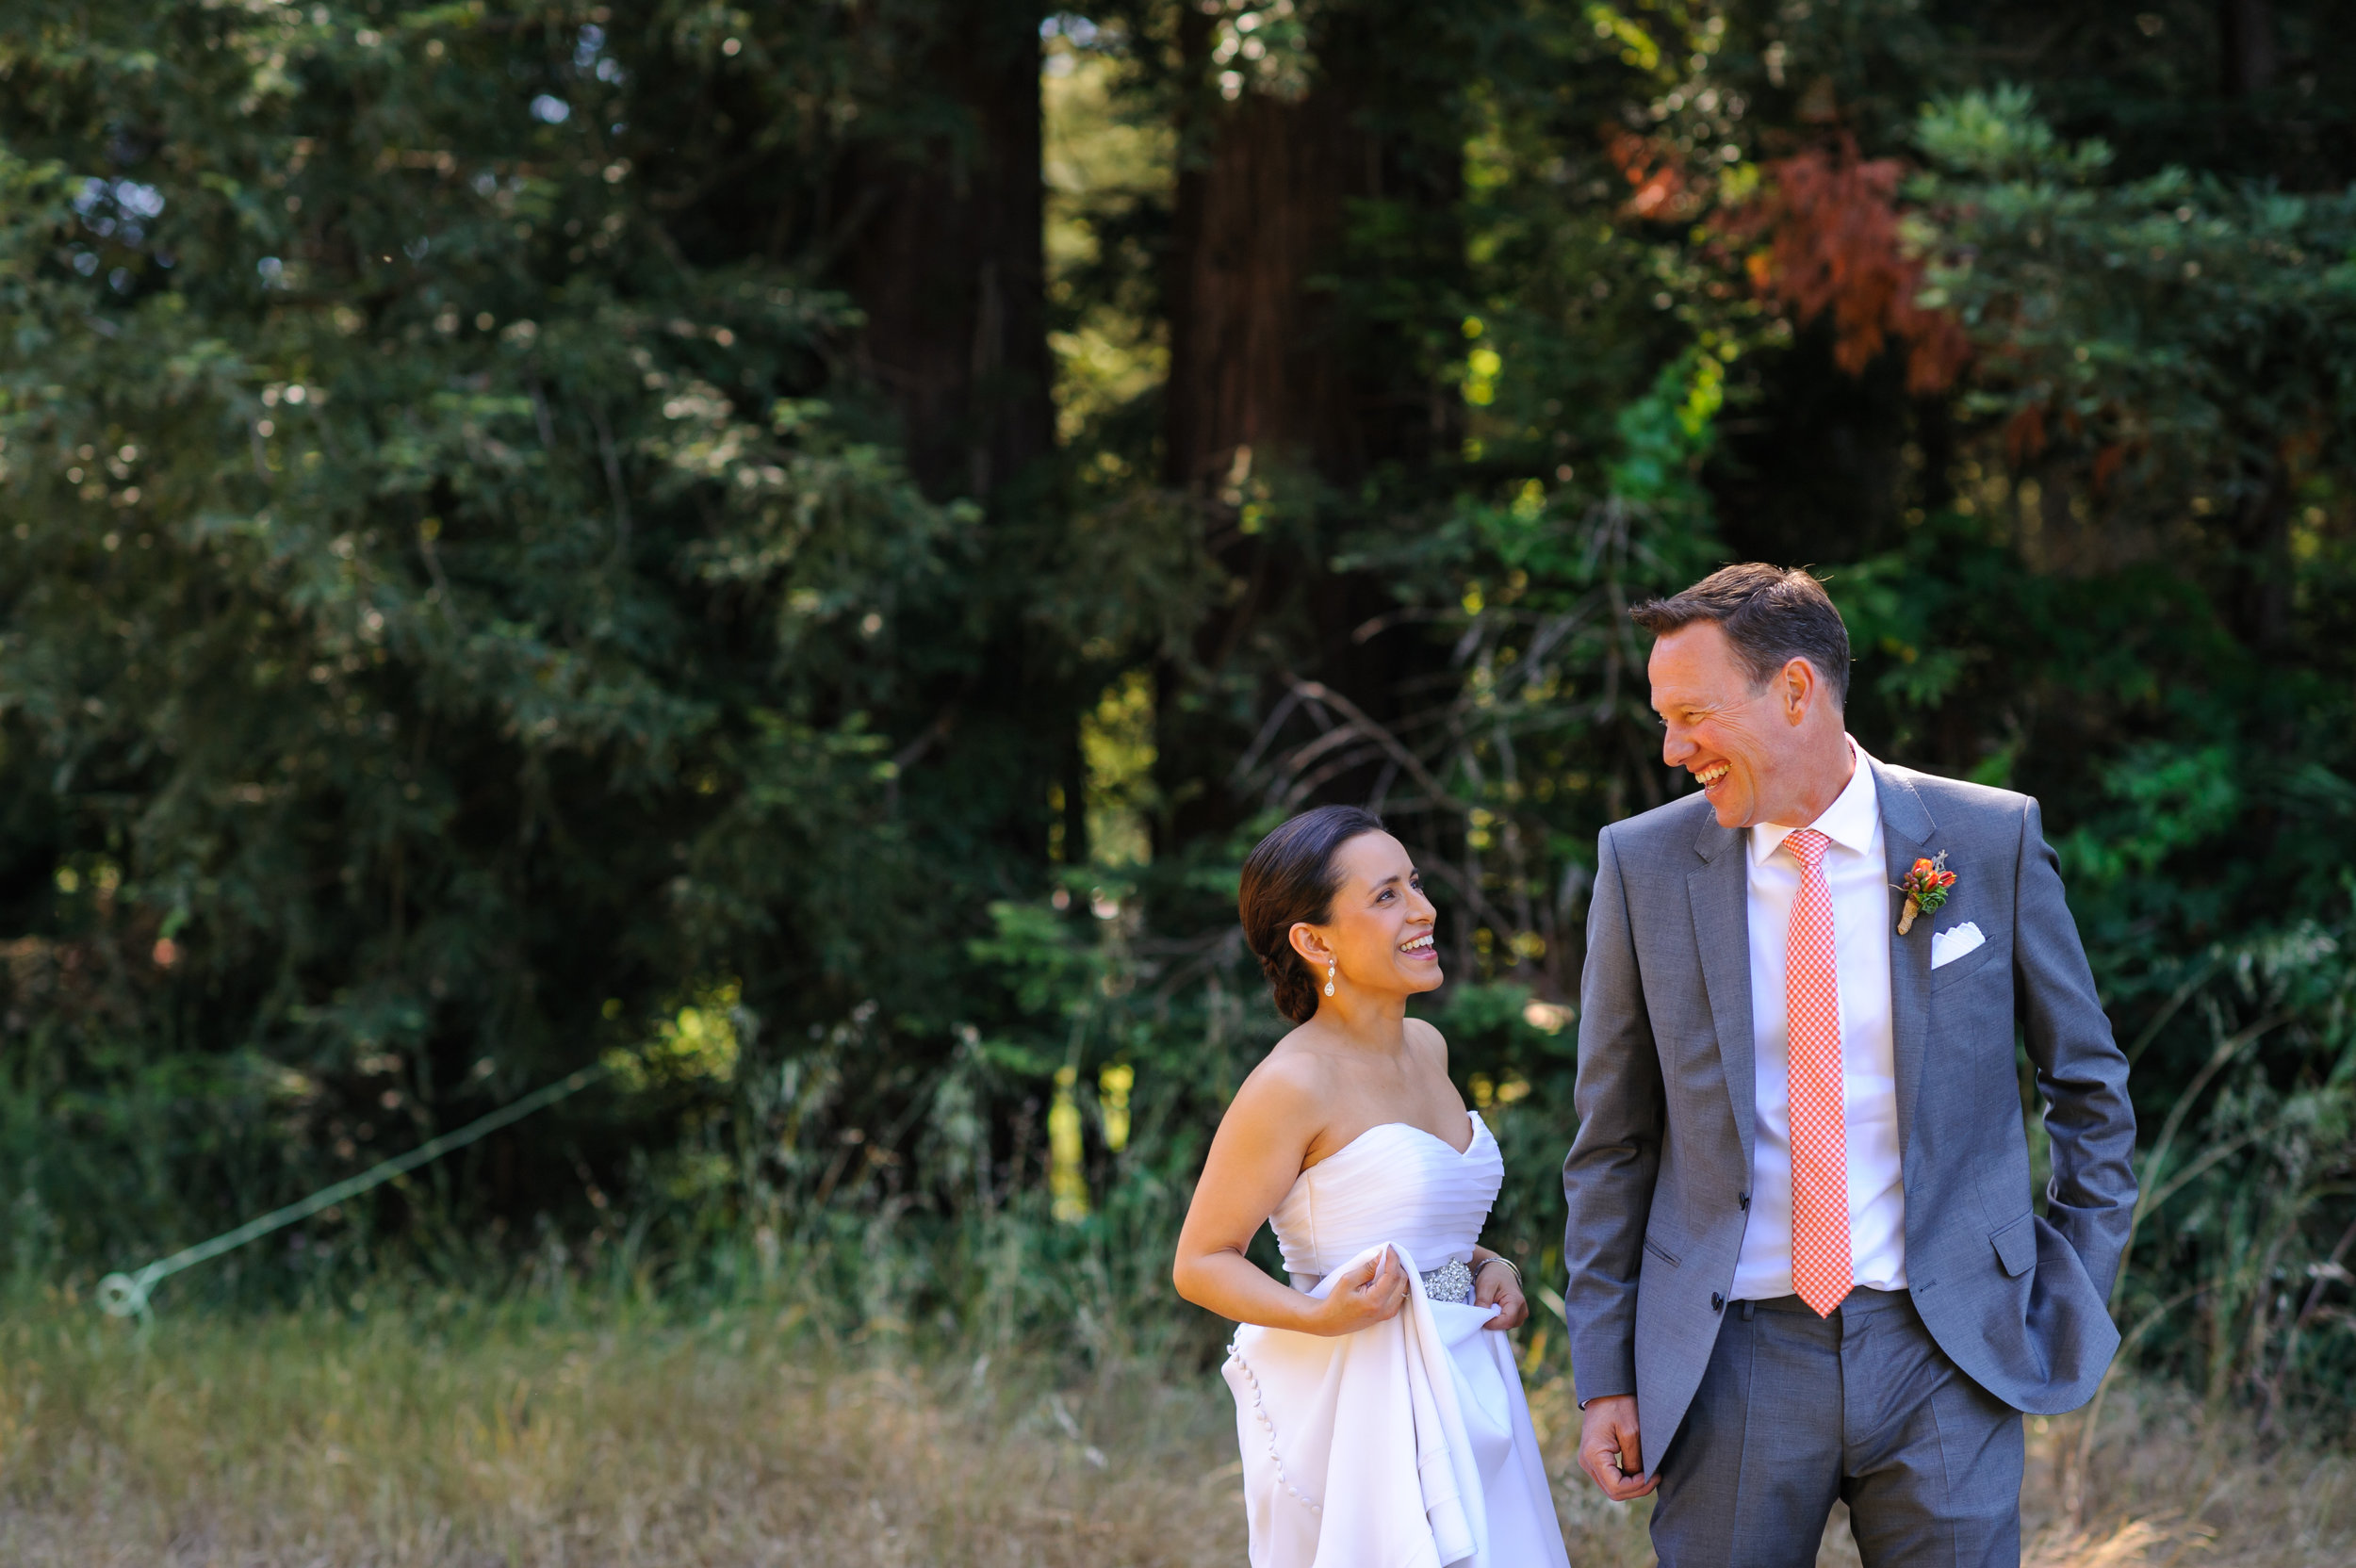 janet-jeremy-006-mountain-terrace-woodside-wedding-photographer-katherine-nicole-photography.JPG